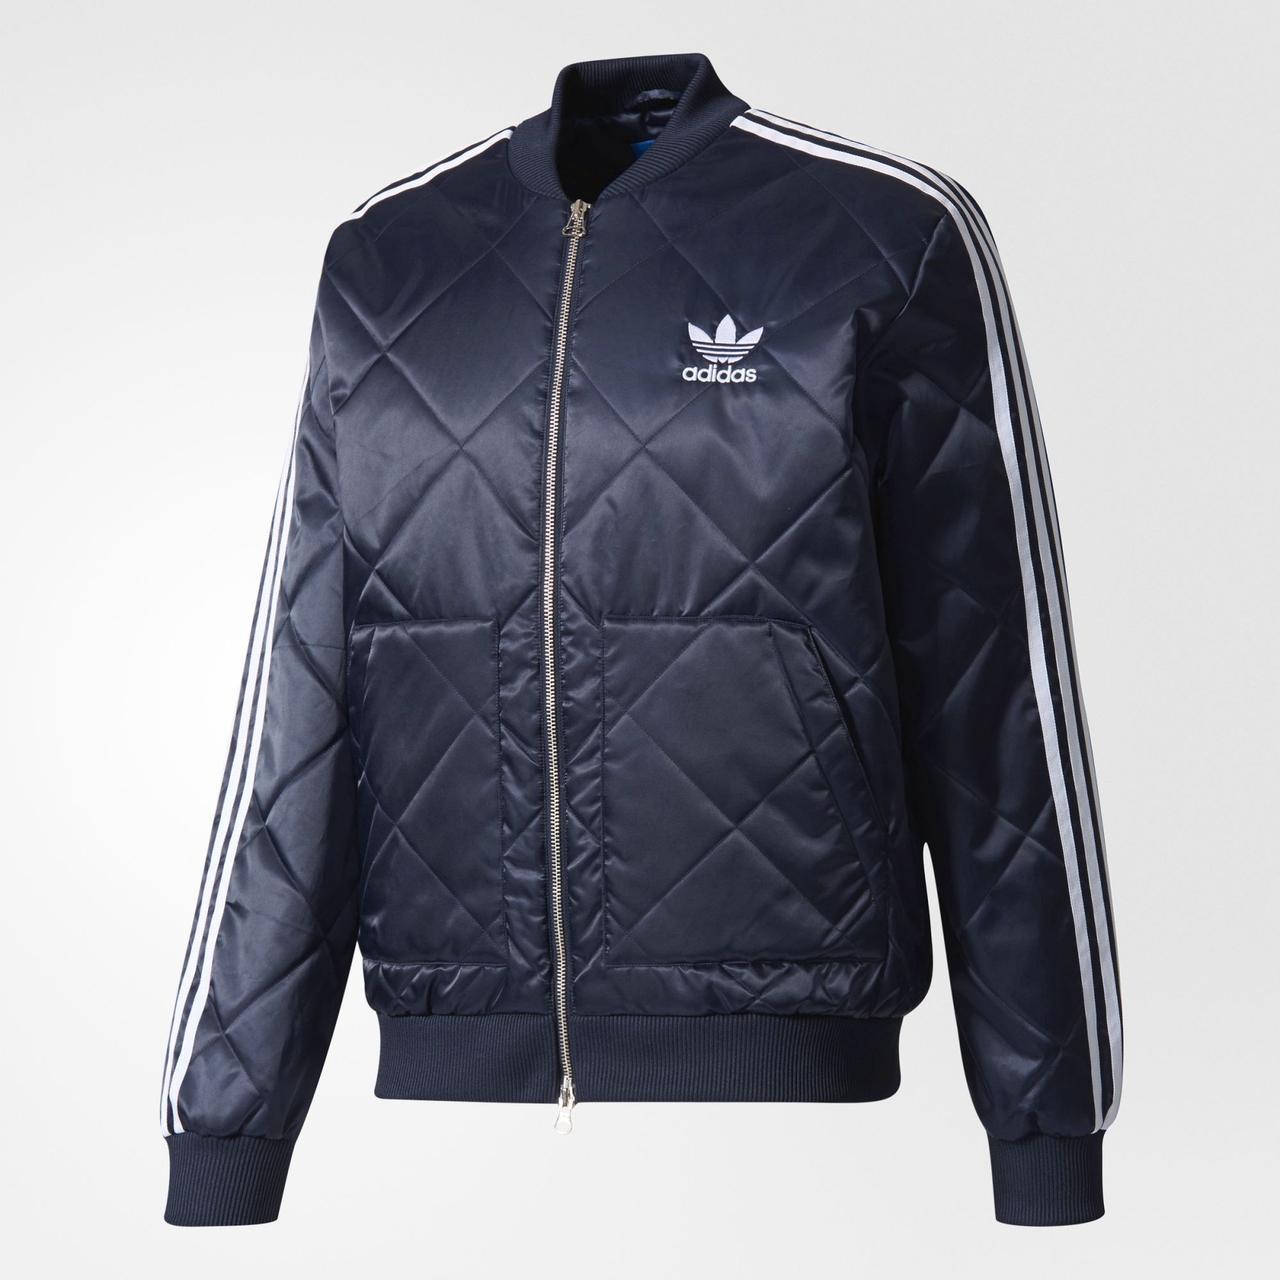 0875f9b48d0e Мужская куртка Adidas Originals SST (Артикул  BR7155) - Интернет-магазин  «Эксперт